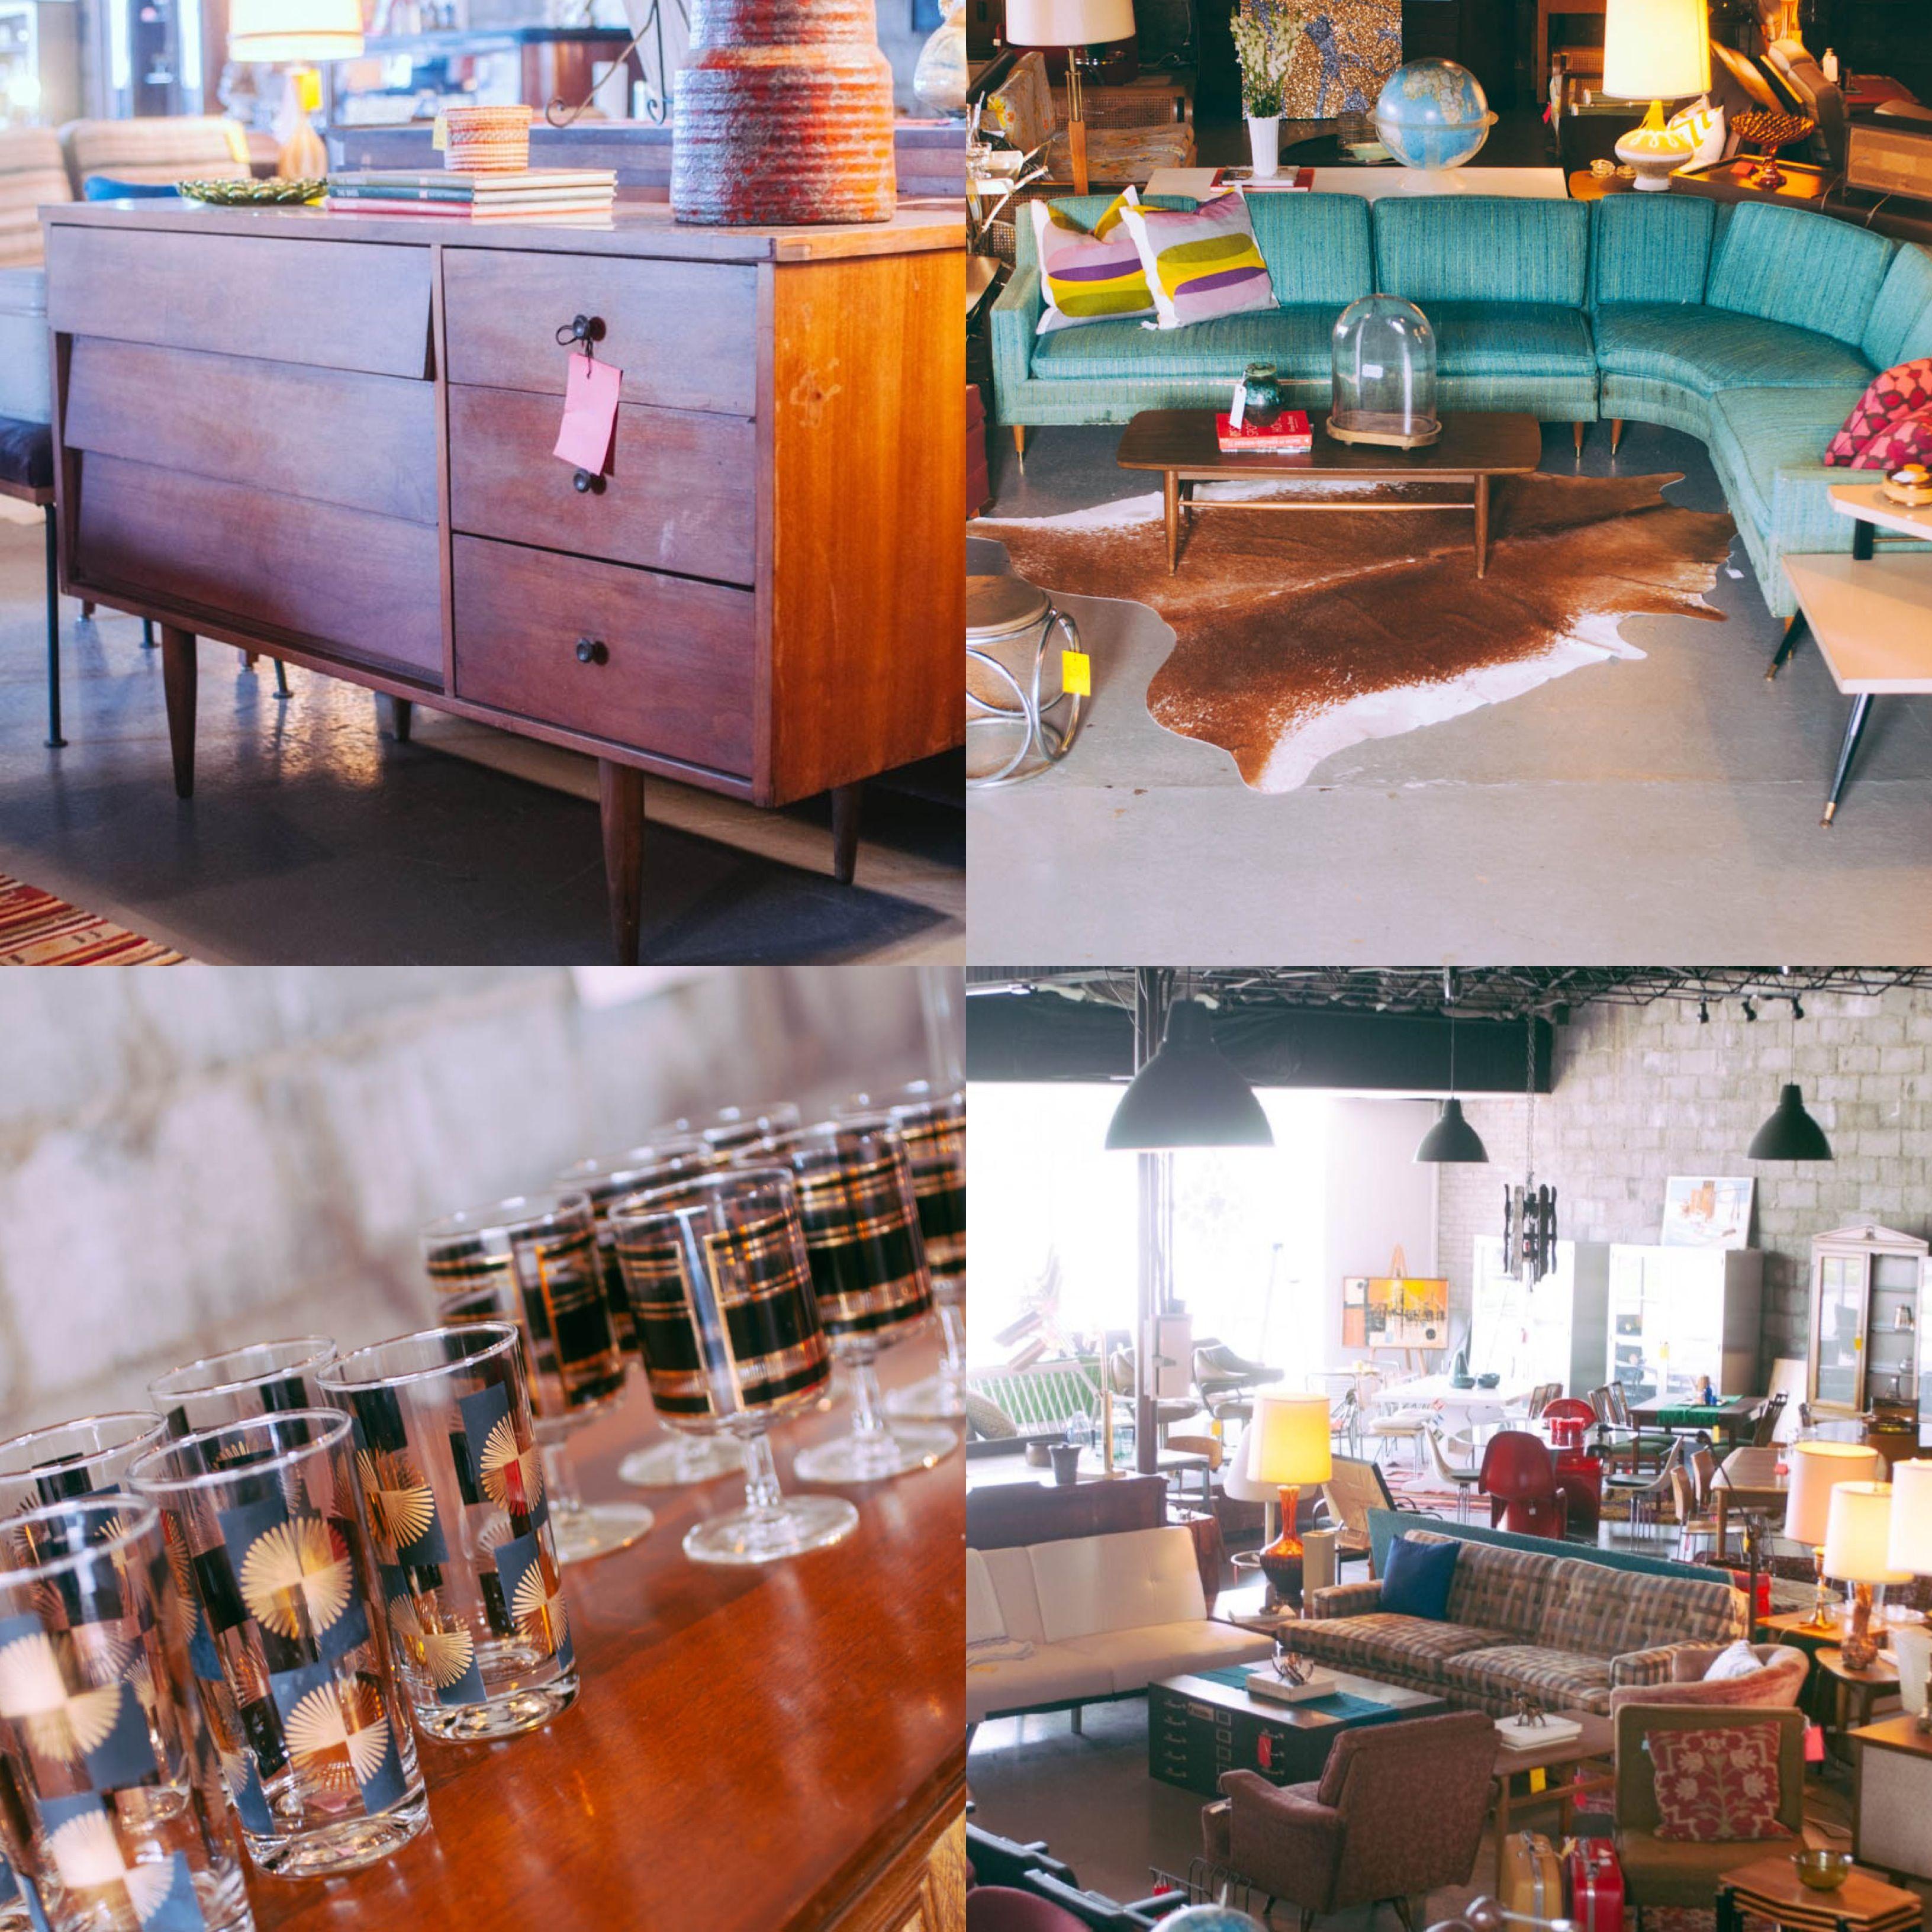 Modern Furniture Tulsa retro den in tulsa, ok. amazing mid century modern furniture